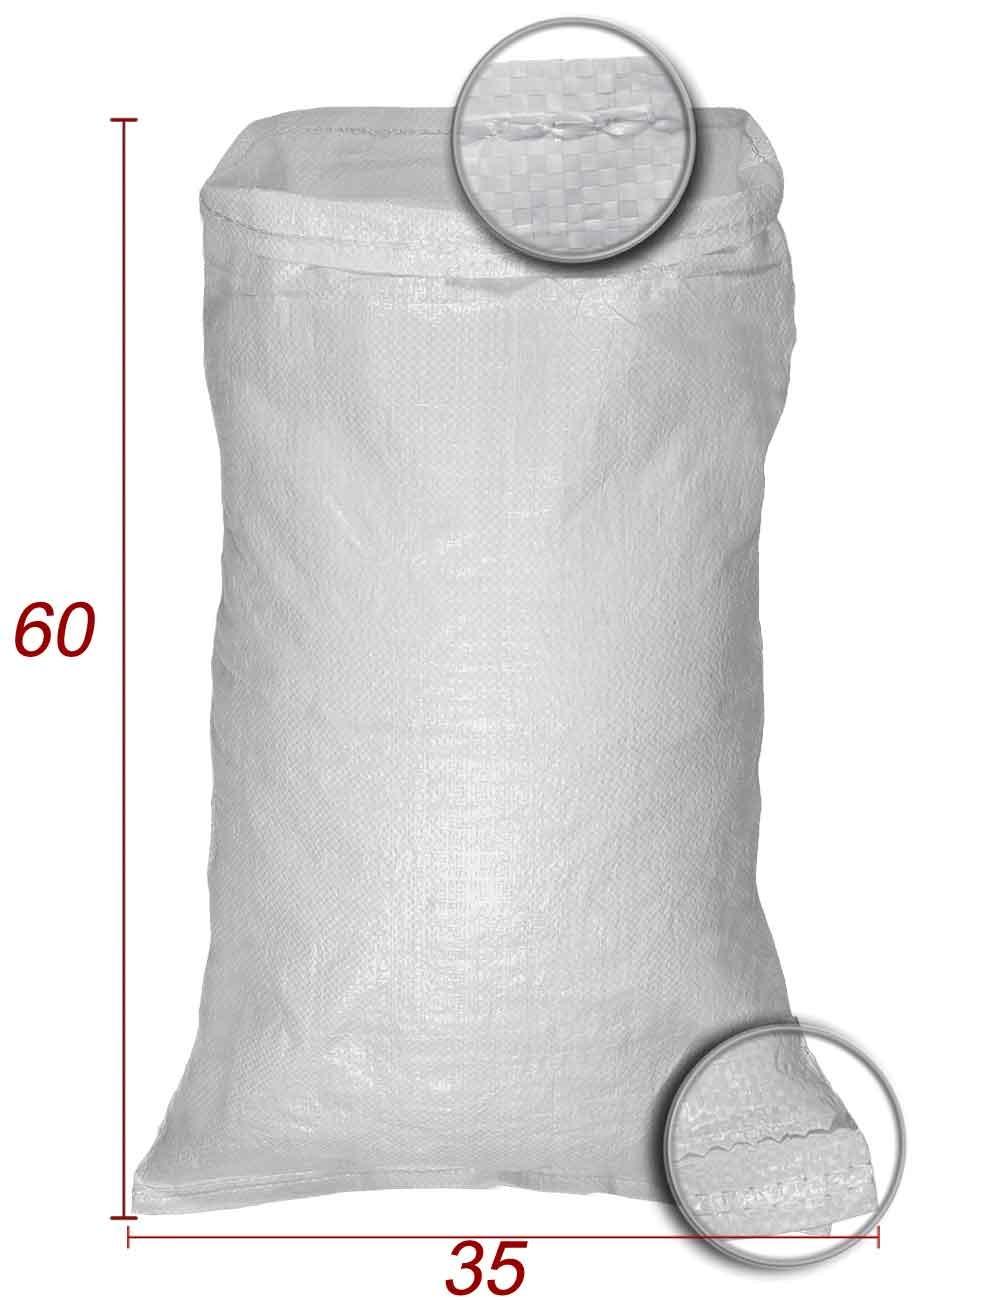 Bolsas PP Reutilizables Tela tejida